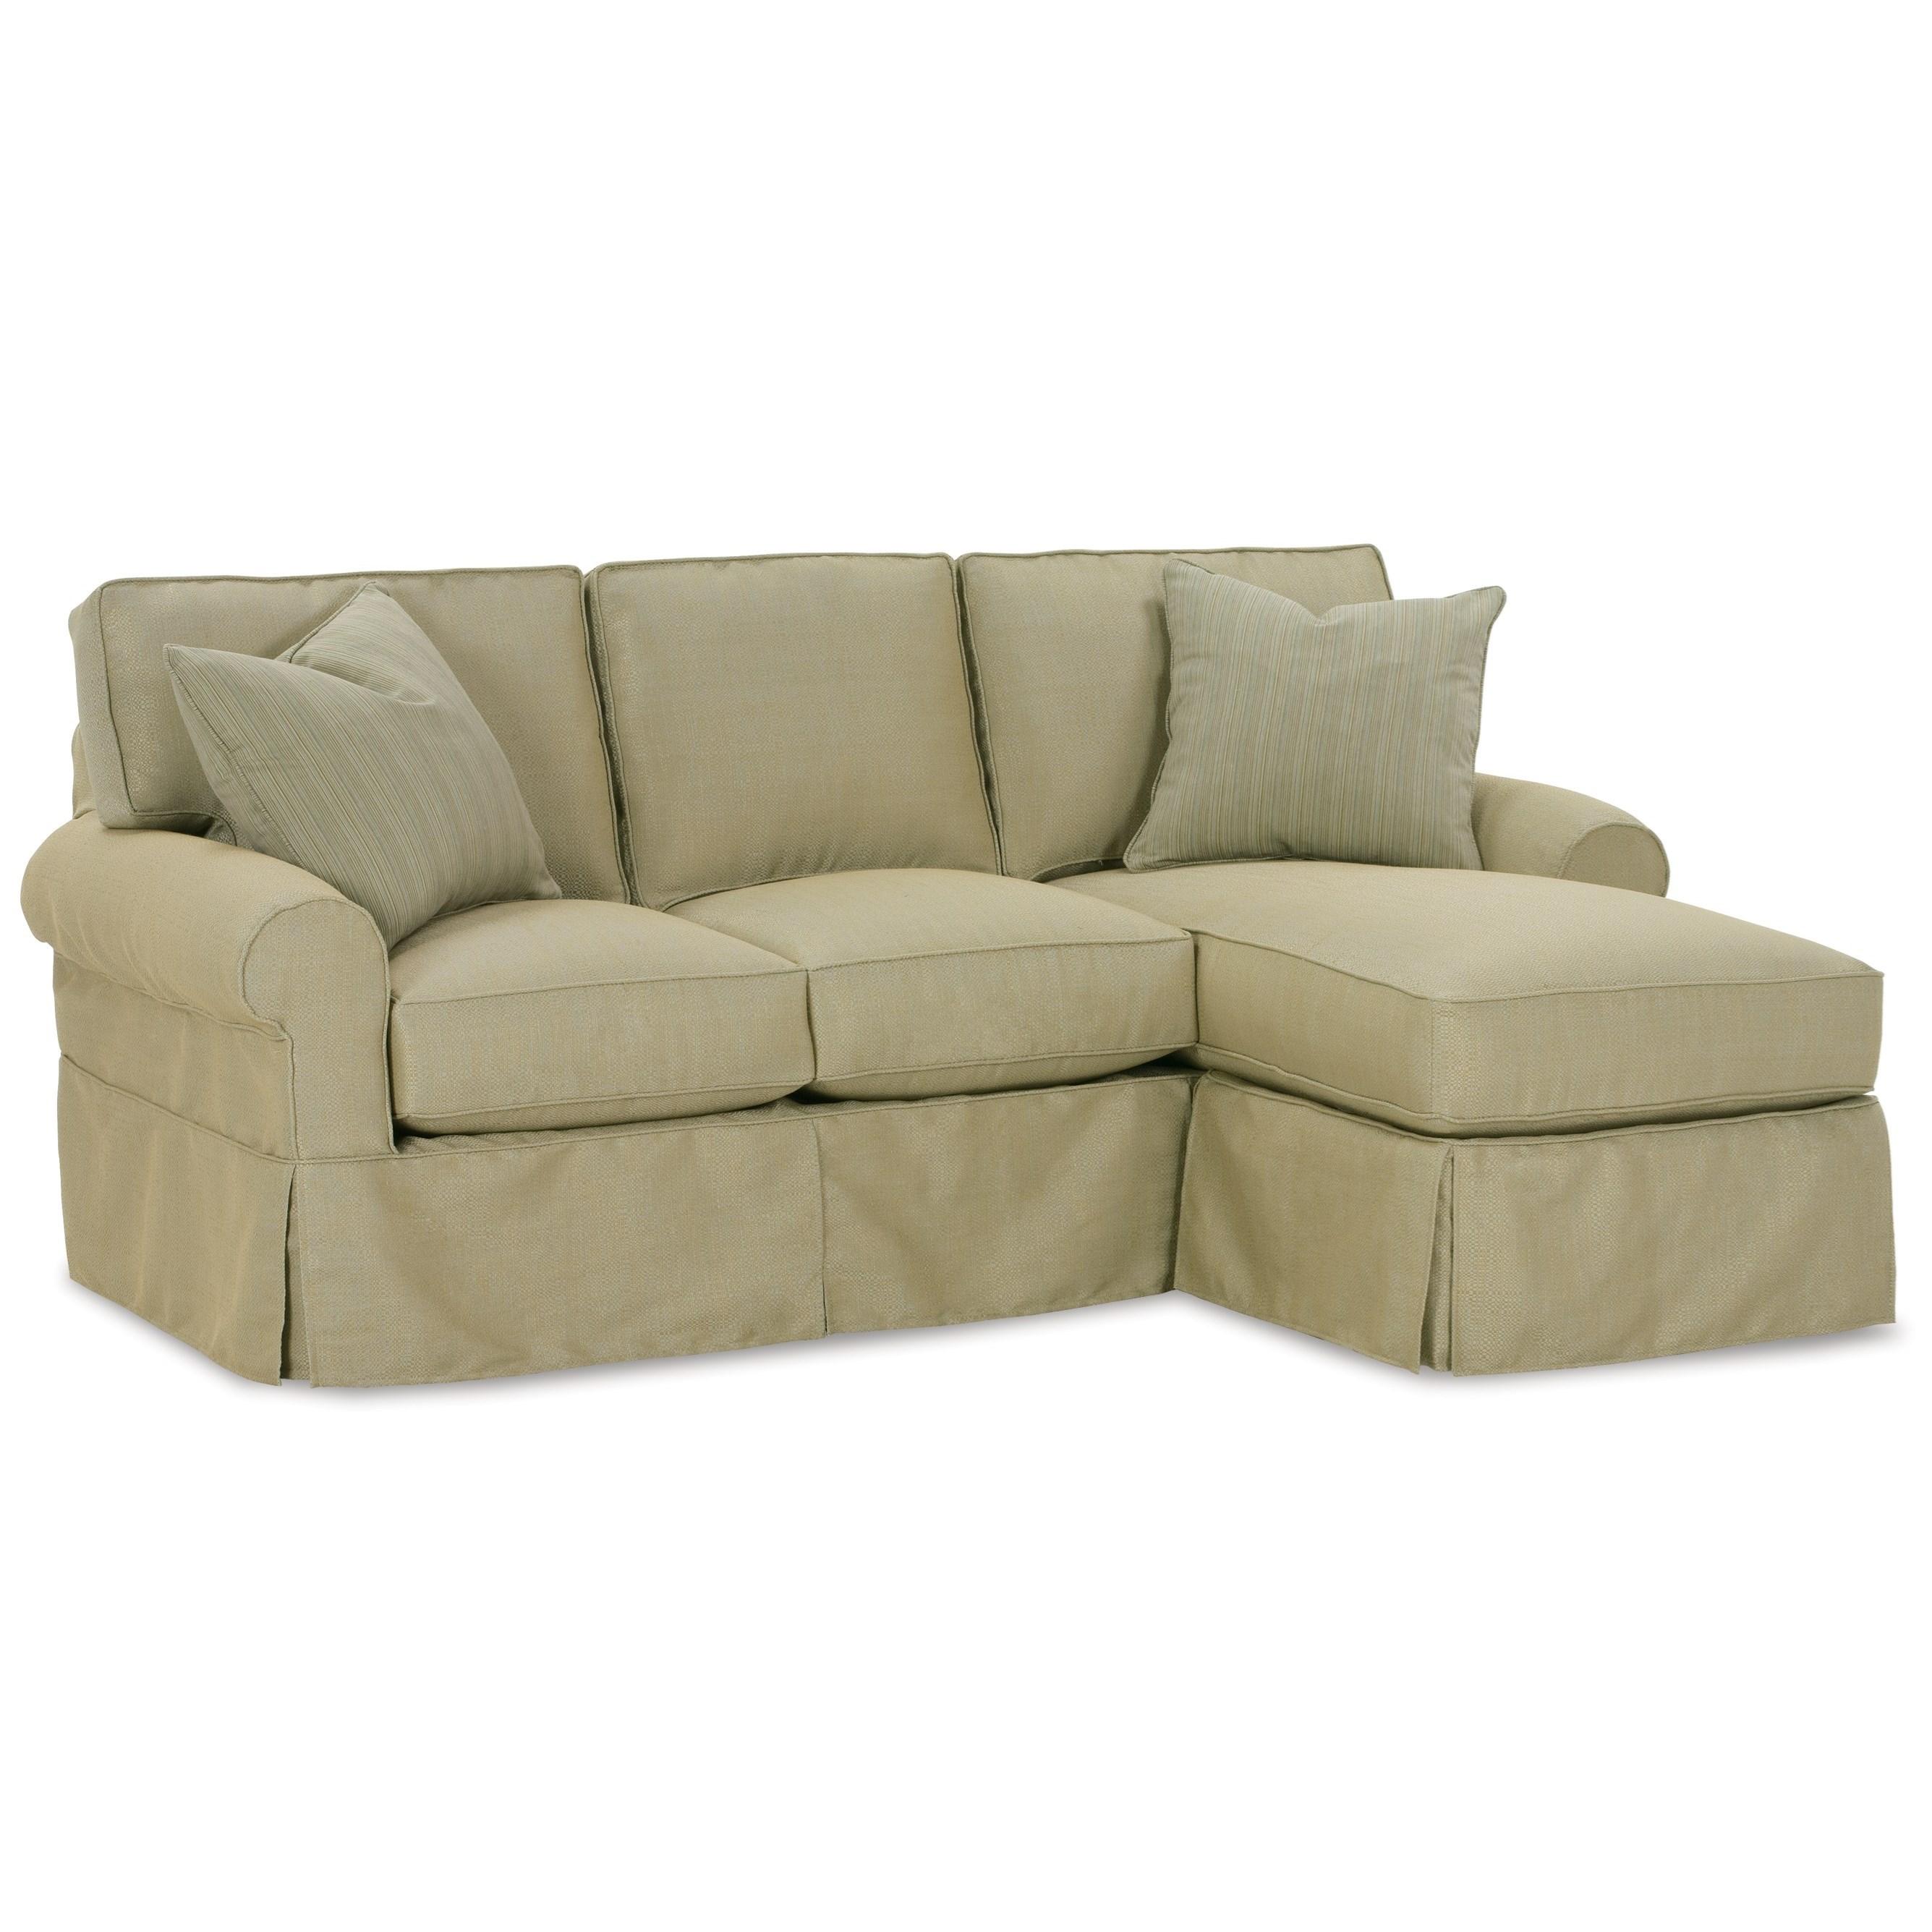 rowe slipcover sofa good sofas nantucket with chaise | baer's ...